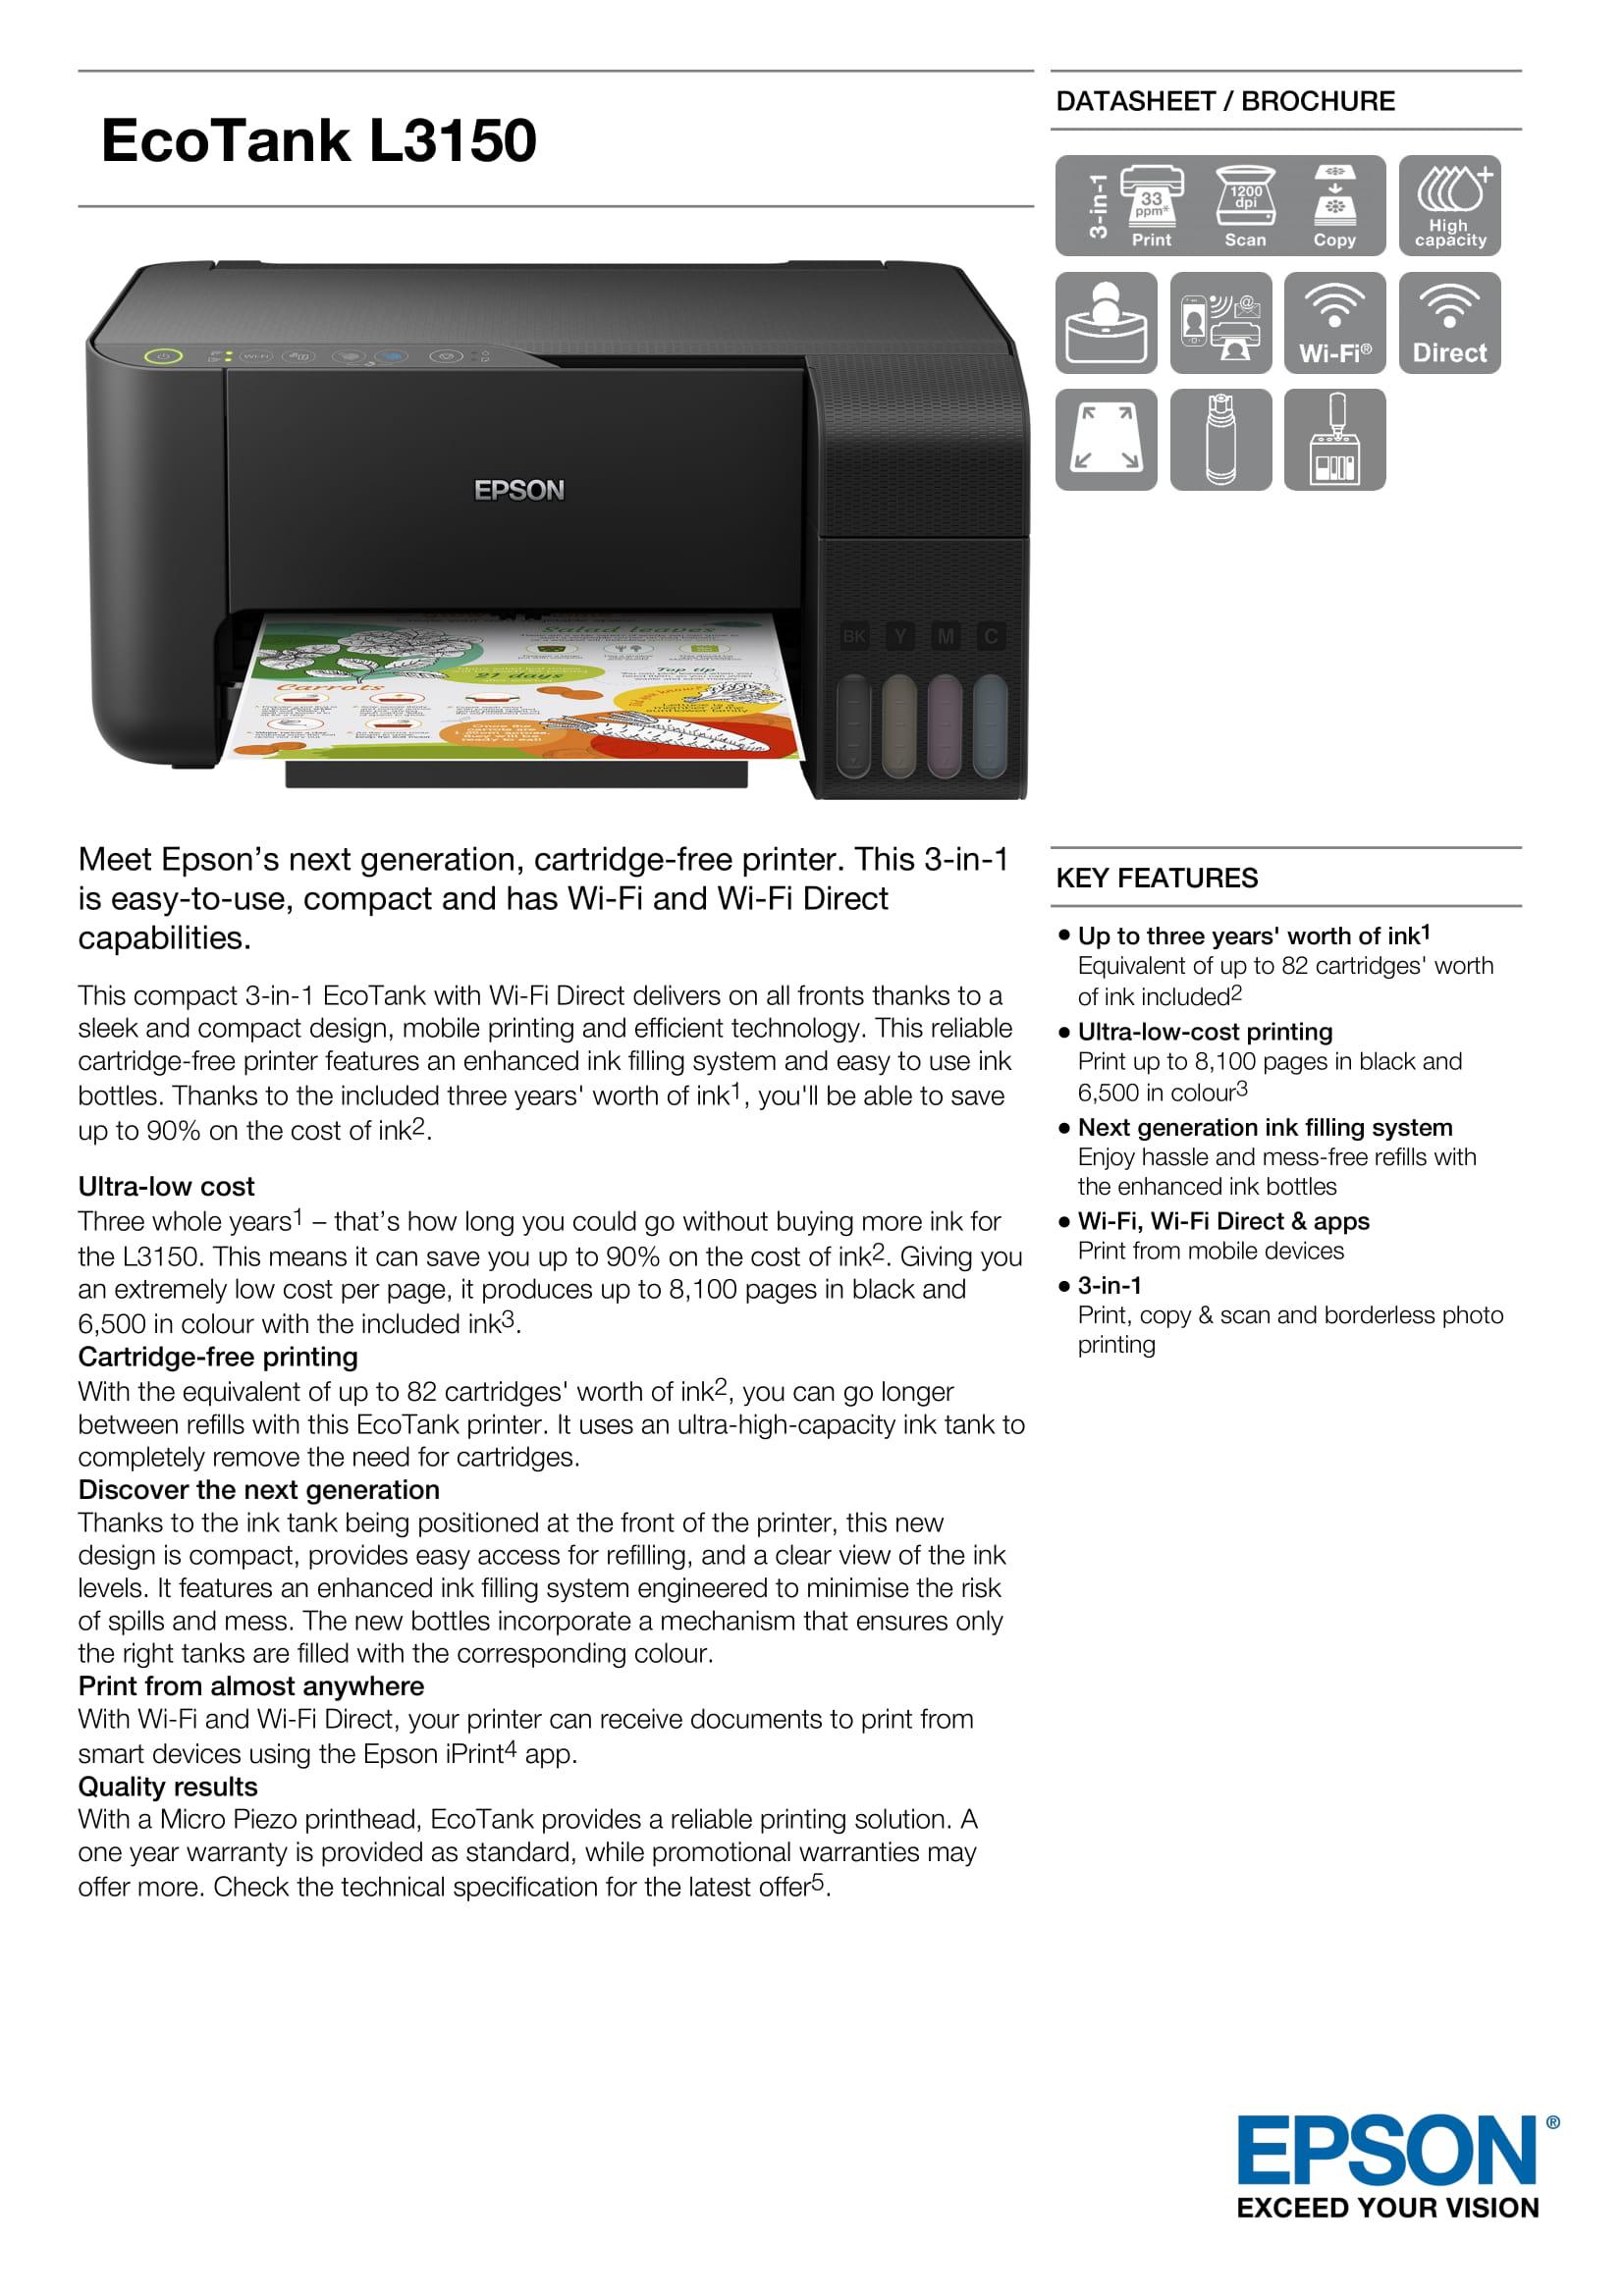 EPSON ECOTANK L3150 | Cartridge-free printing - Pearlblue Tech